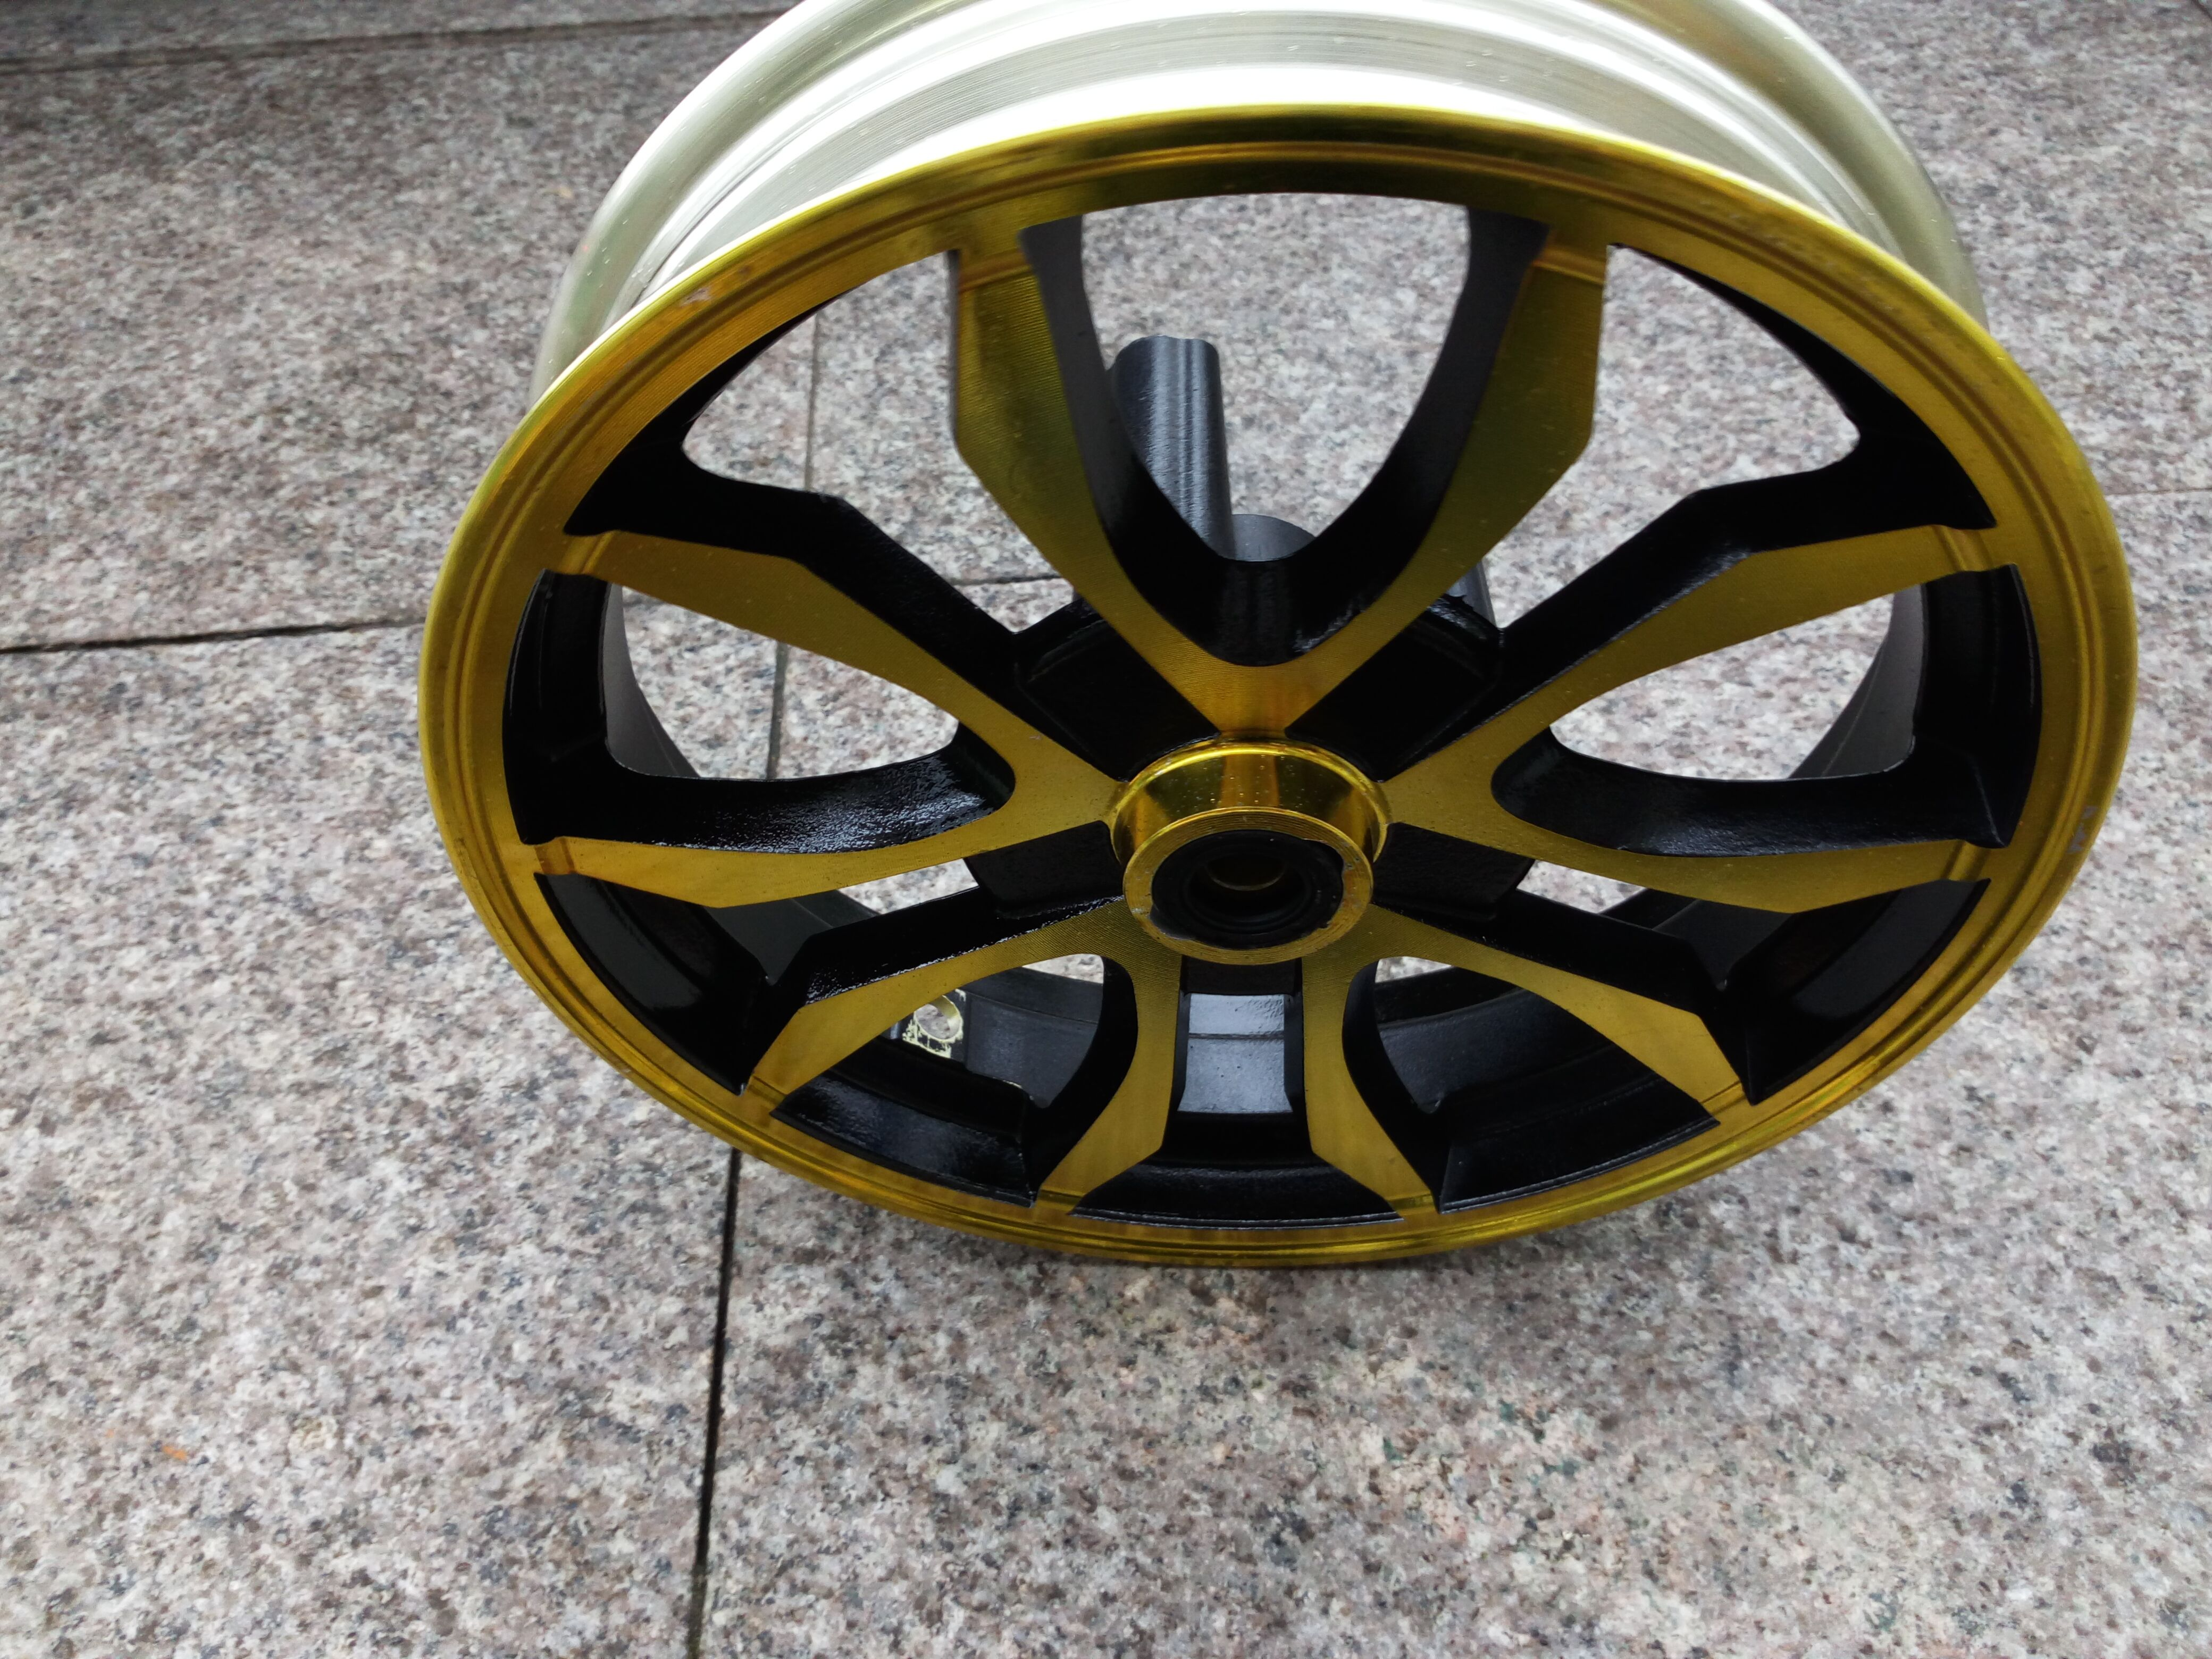 Car wheel hub 10 inch aluminum Market installation hole 12220(China (Mainland))